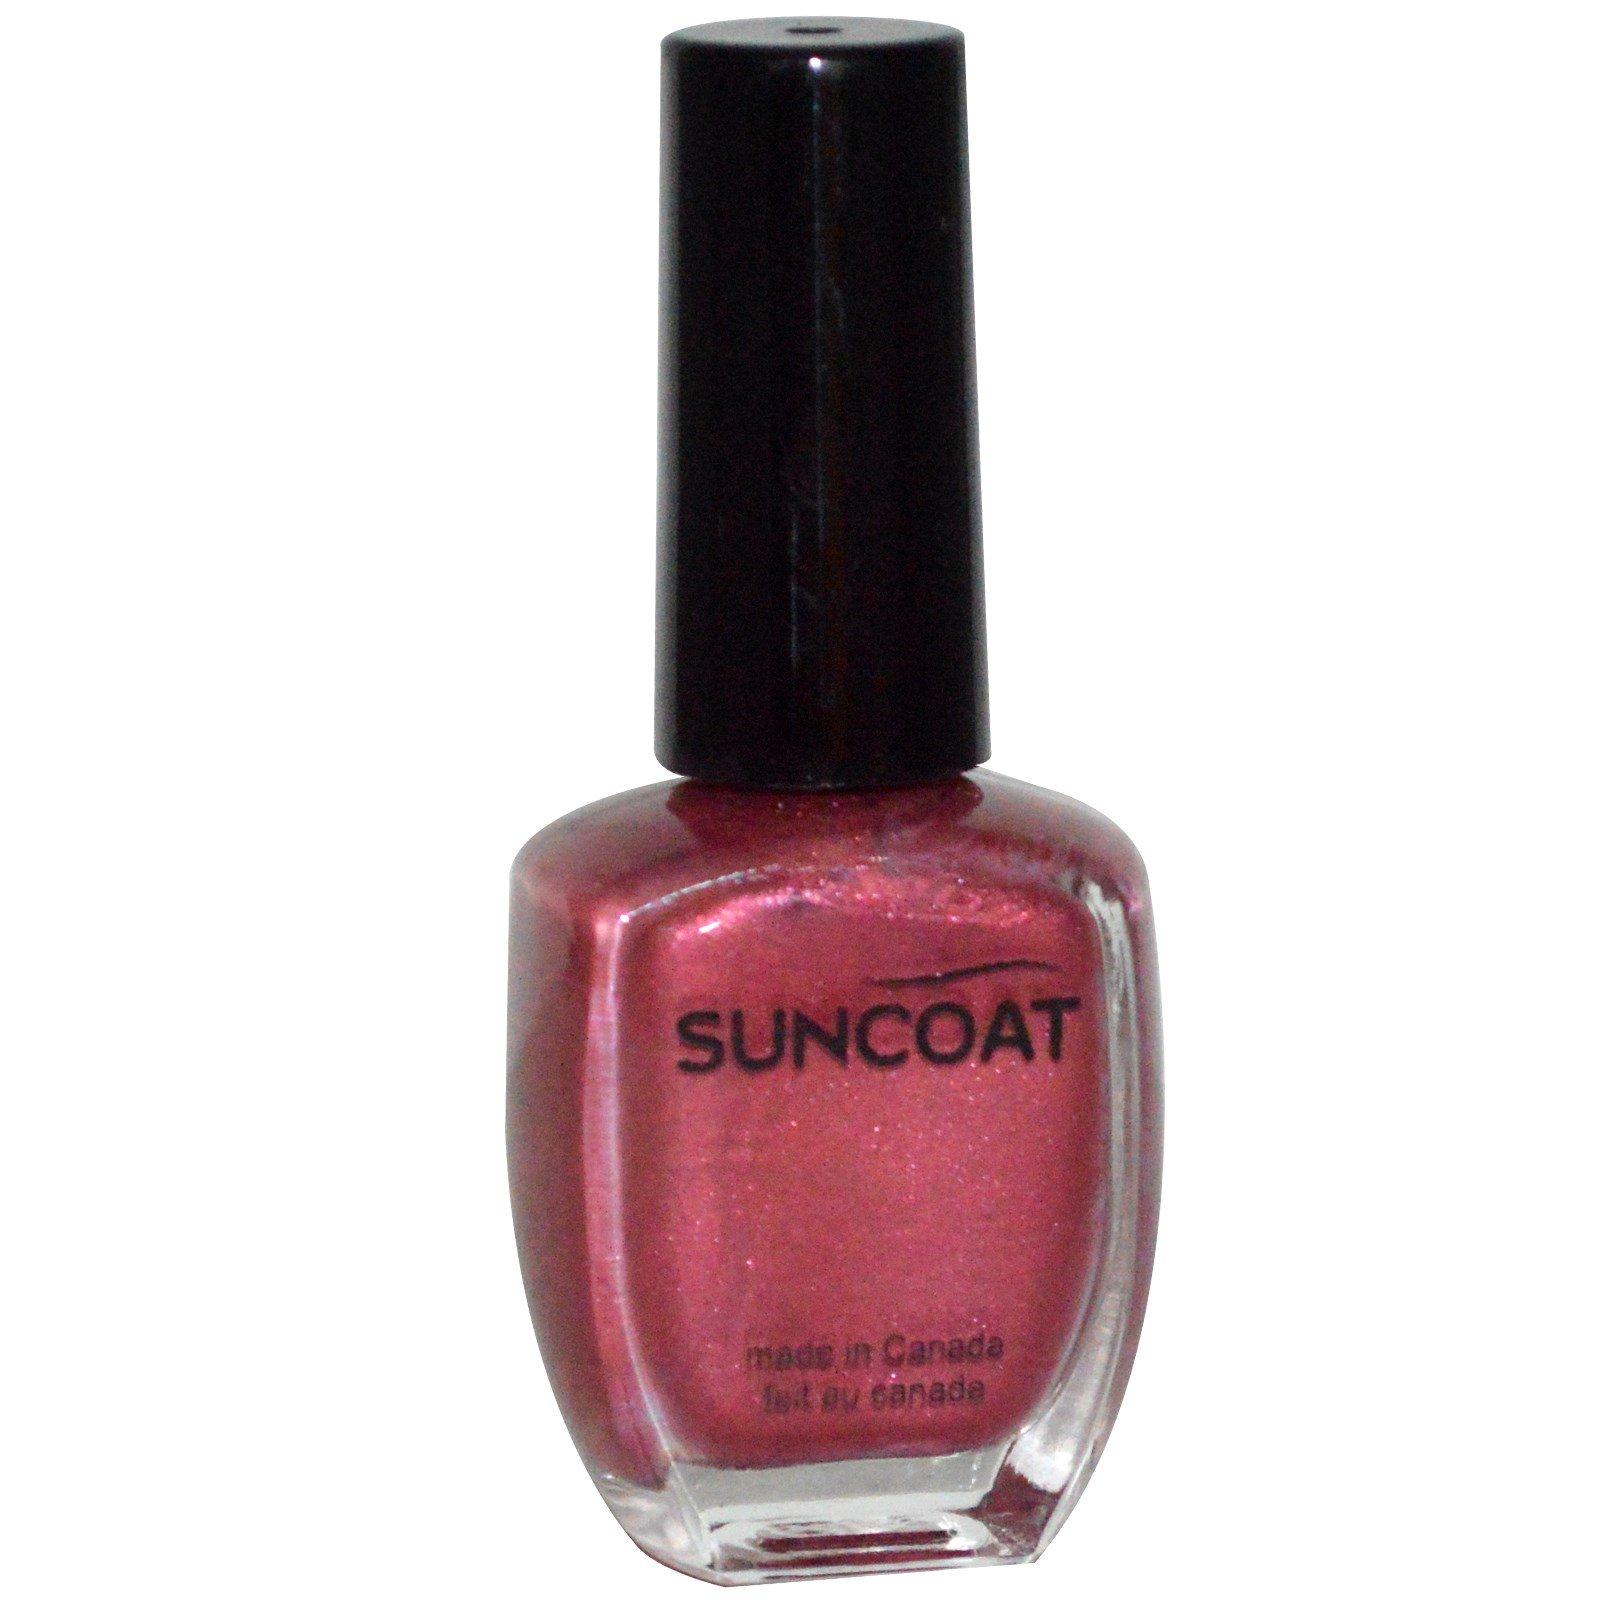 Suncoat, Esmalte de Uñas, Púrpura de Medianoche, 0.43 fl oz (13 ml ...